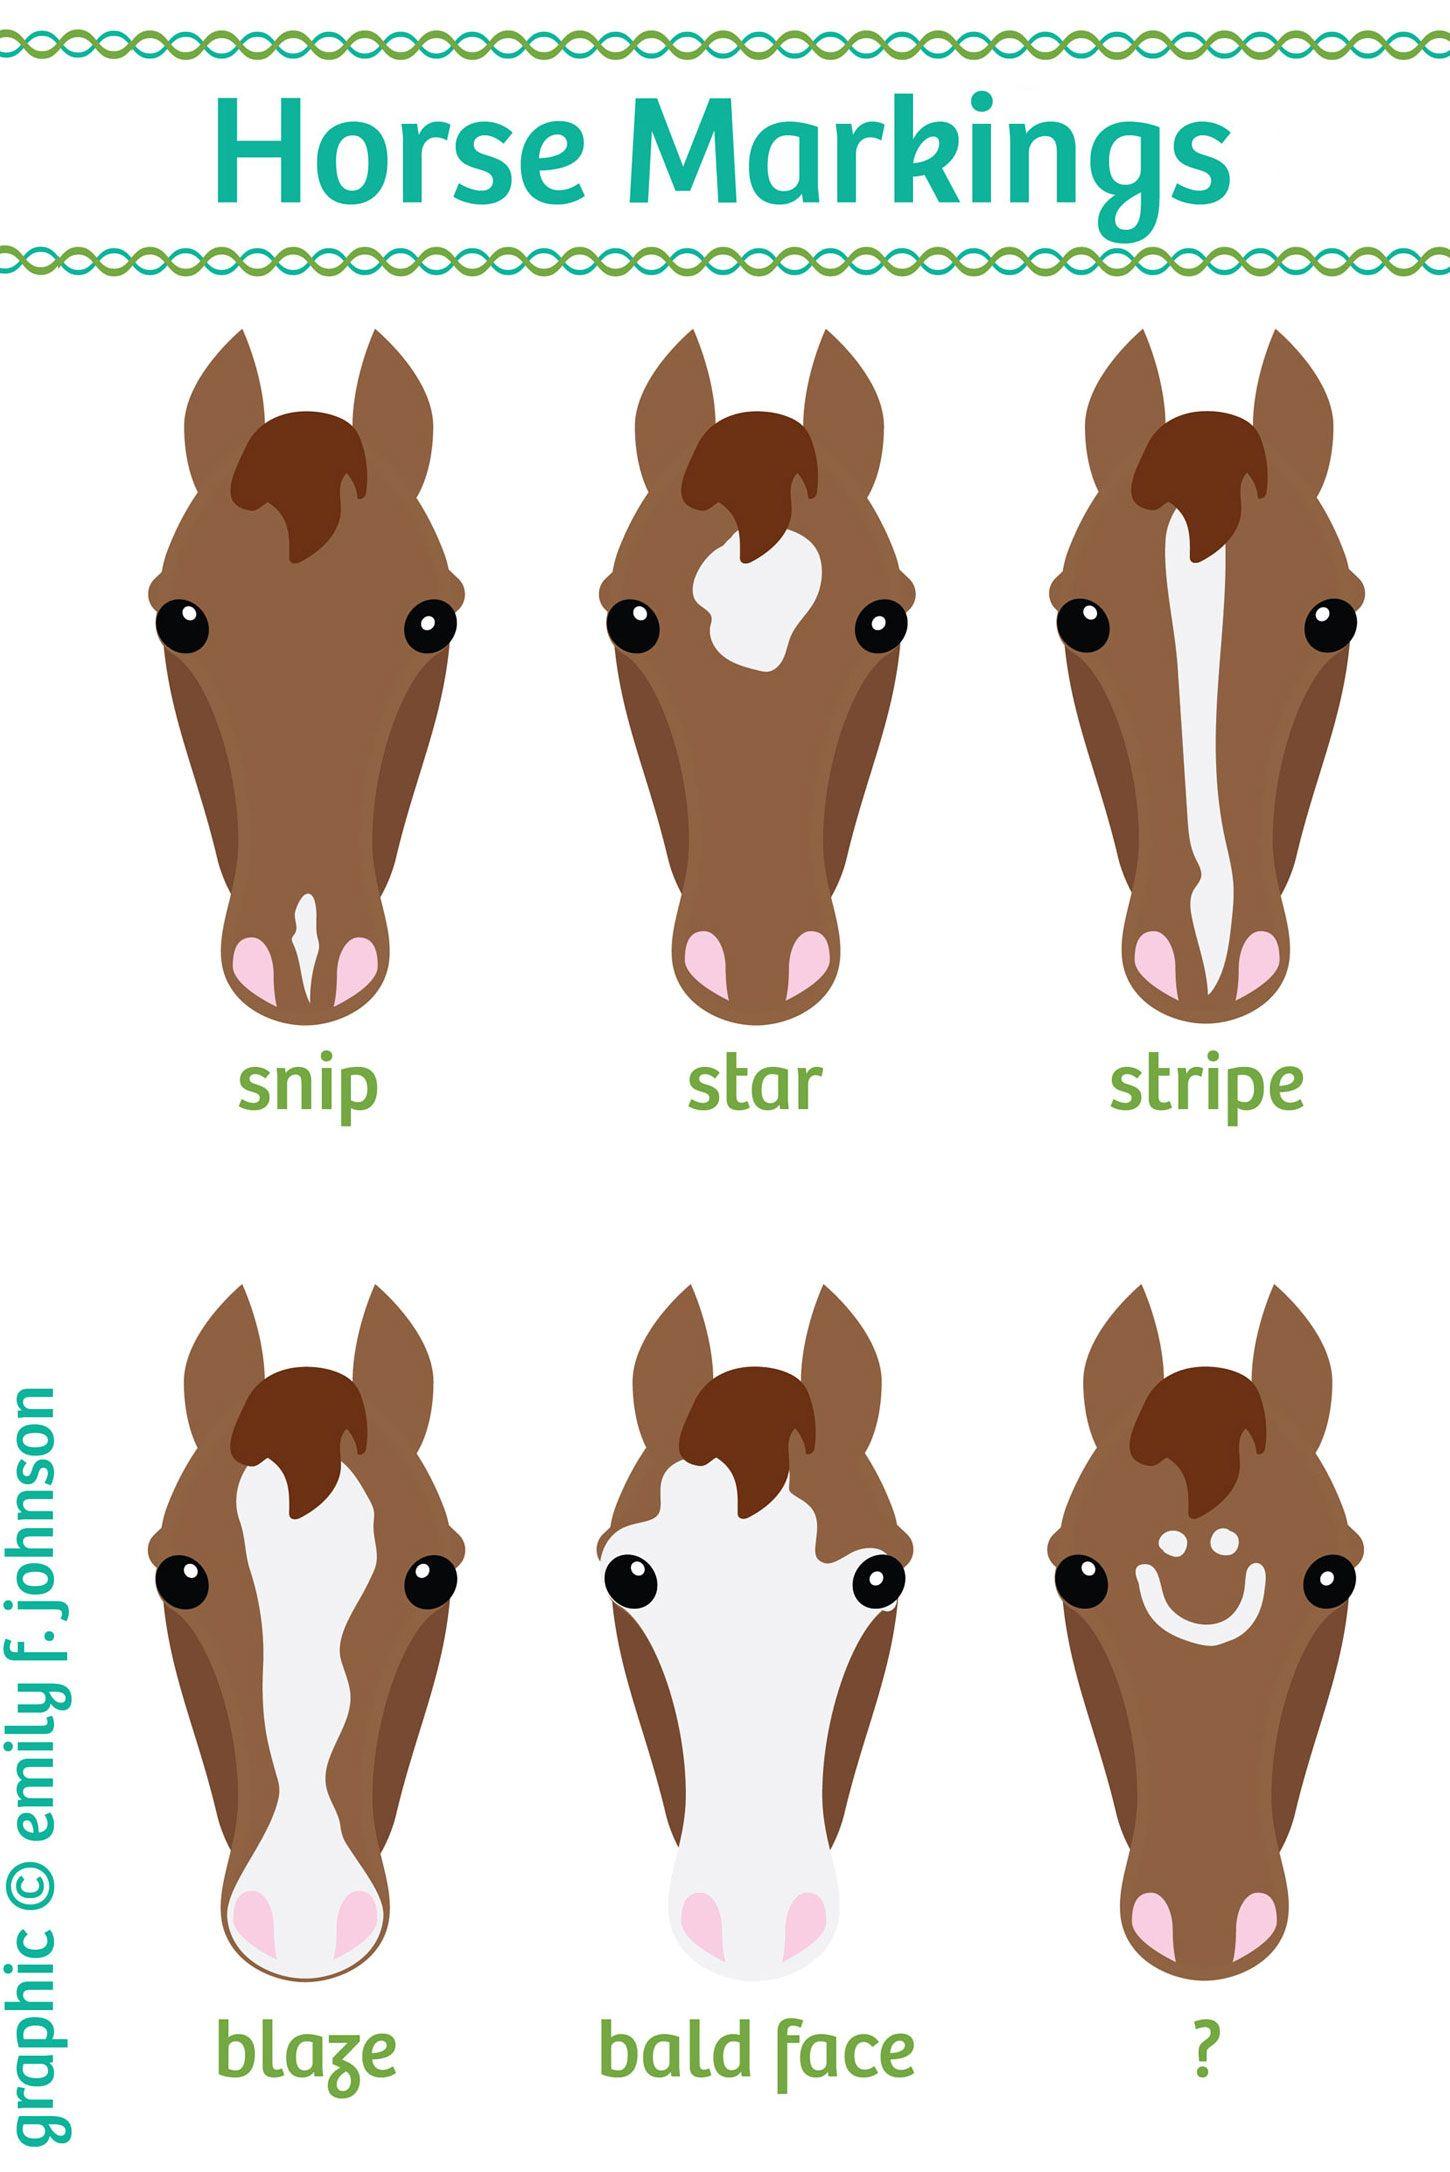 Horse Face Markings Chart